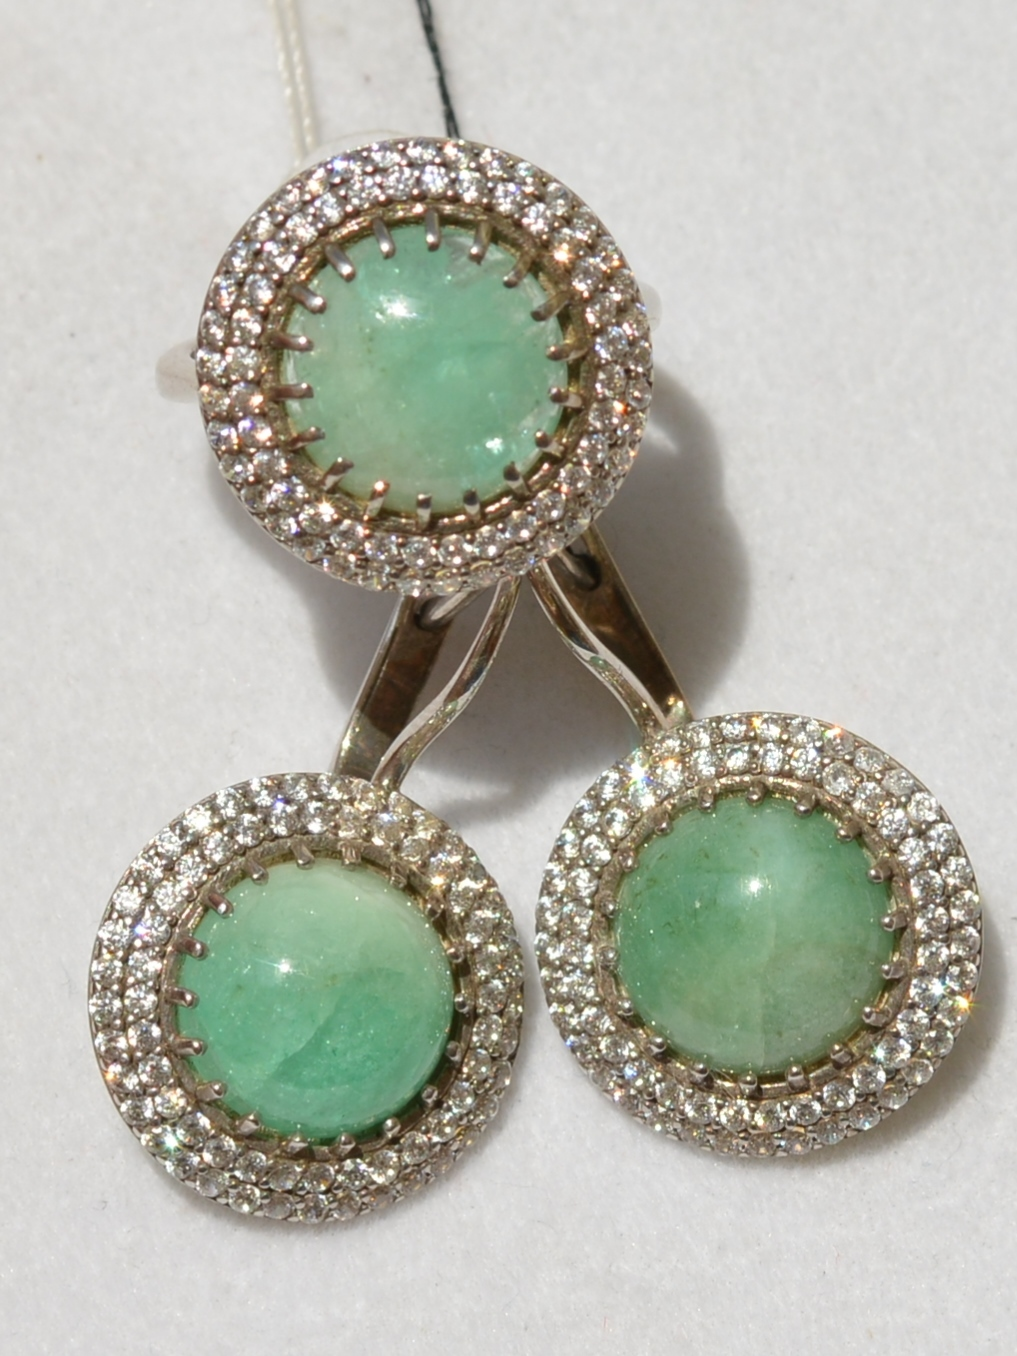 ЭПЛ. Якутские бриллианты | 1356x1017